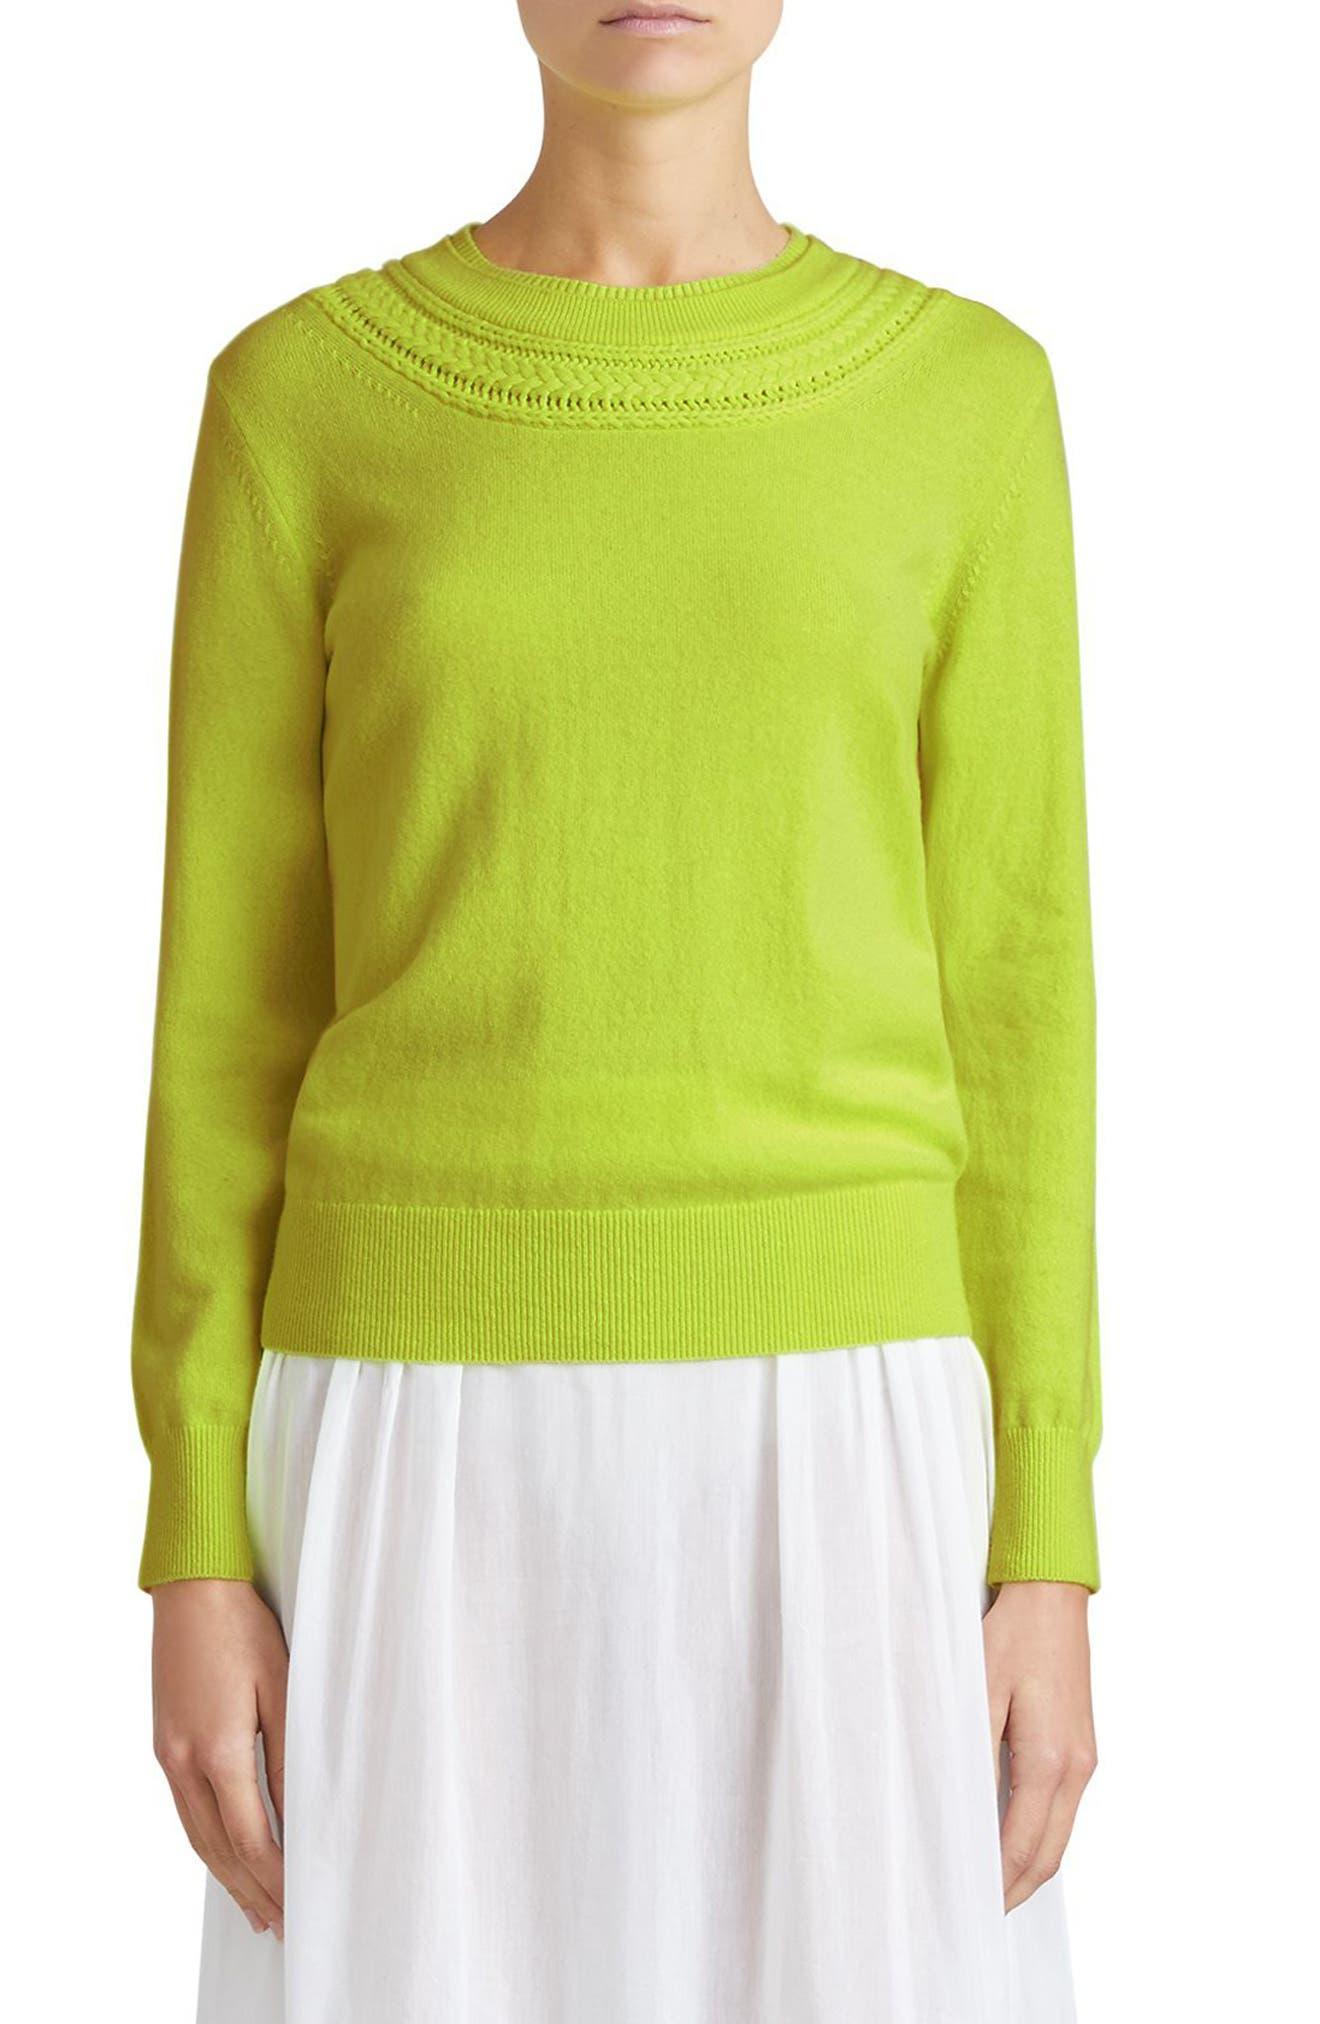 Burberry Guadaira Cashmere Sweater